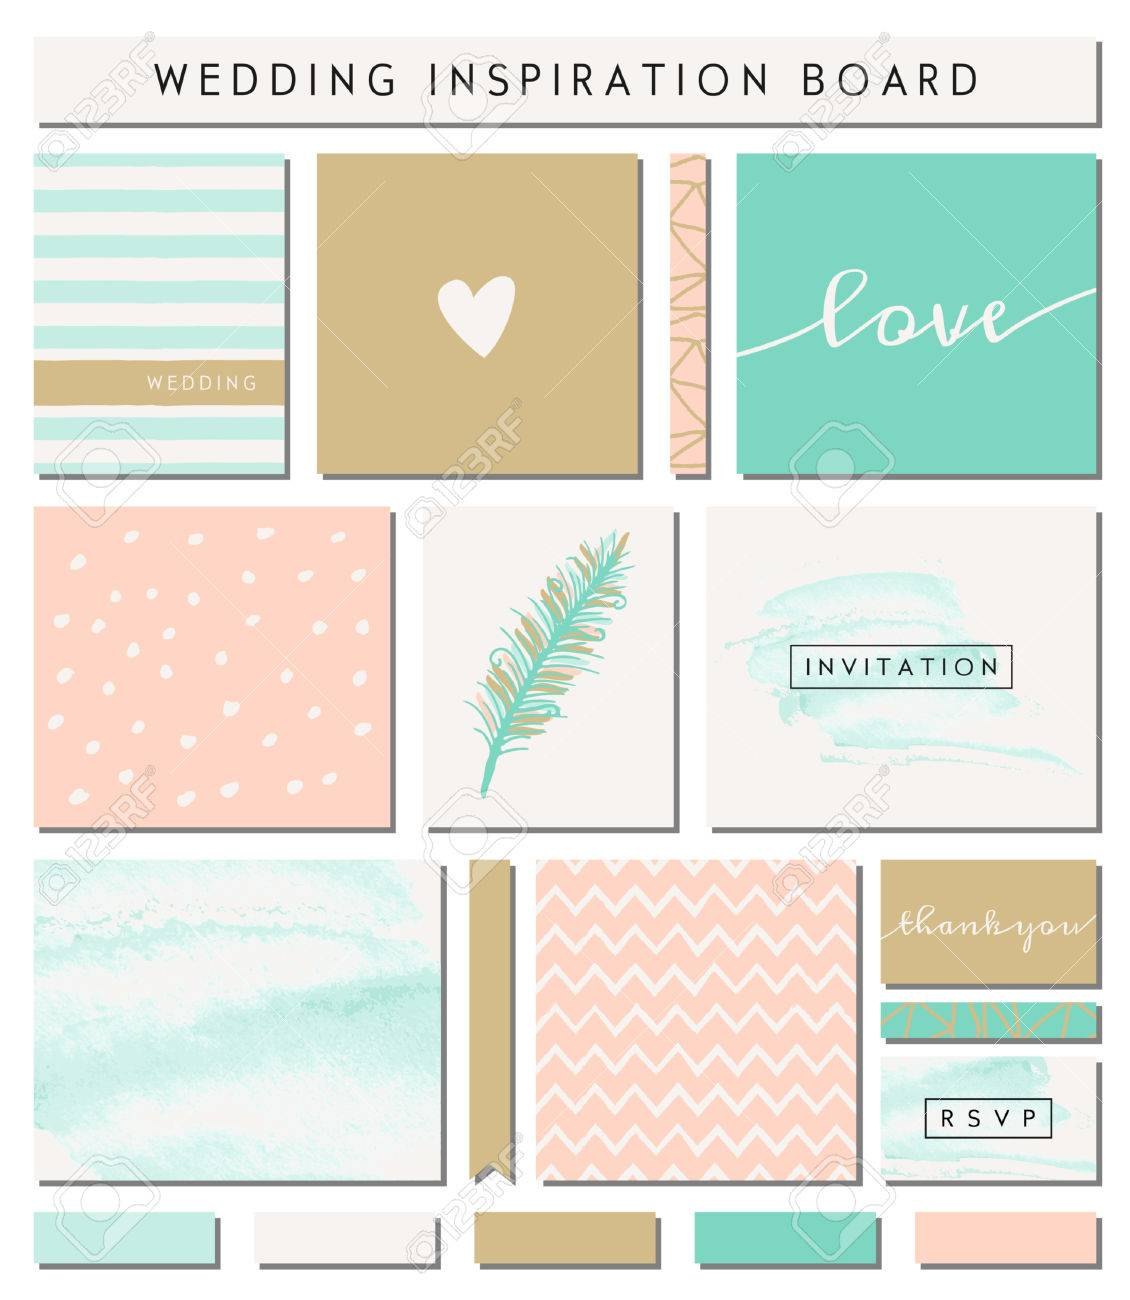 A Set Of Wedding Invitation Templates, Seamless Patterns, Ribbons ...